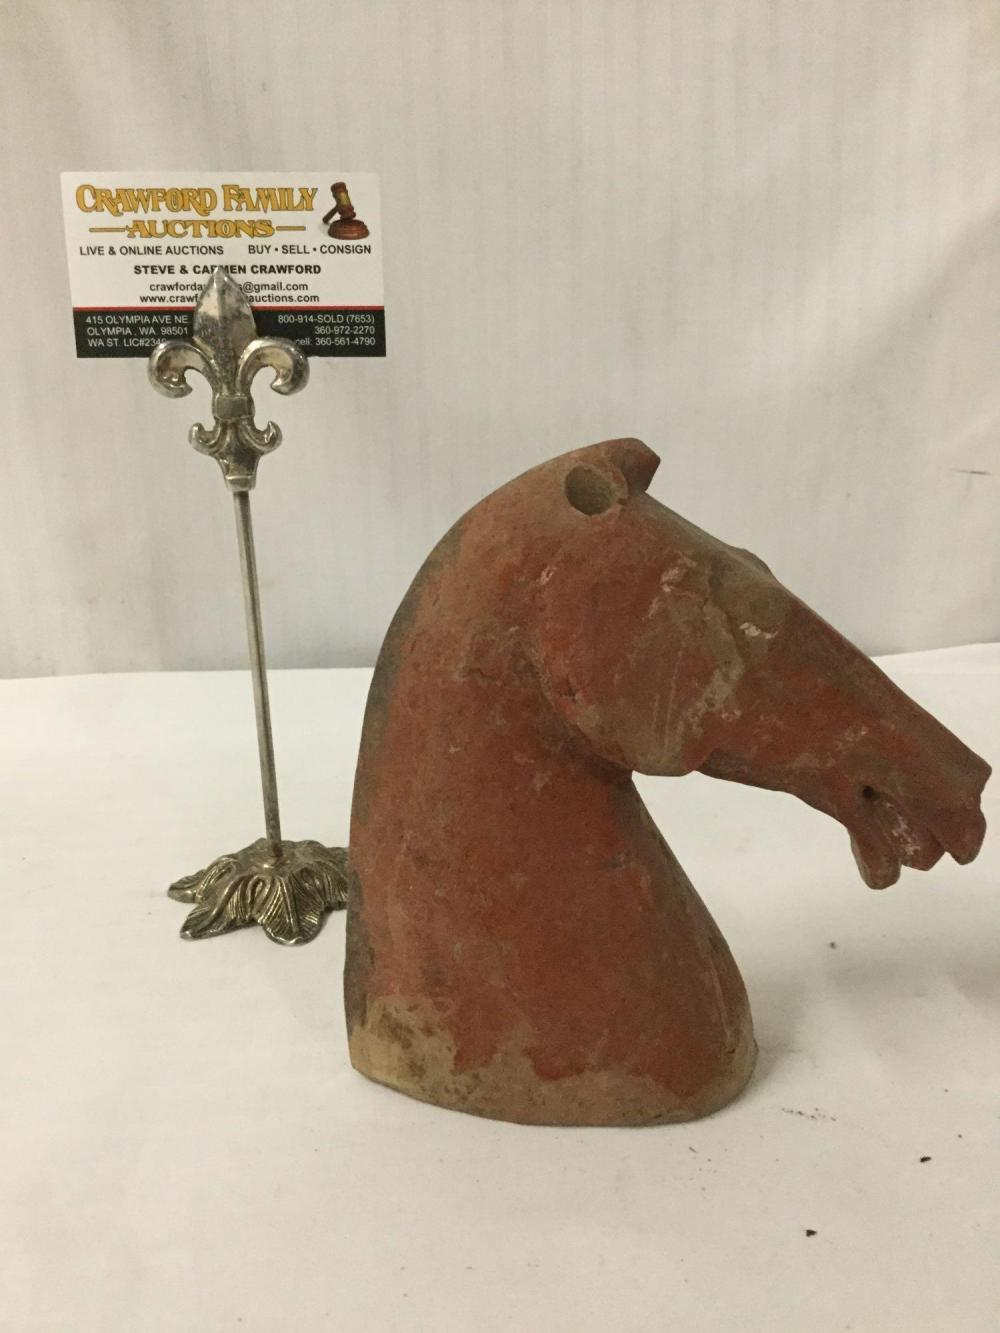 Lot 390: Antique painted ceramic archaistic horse head sculpture